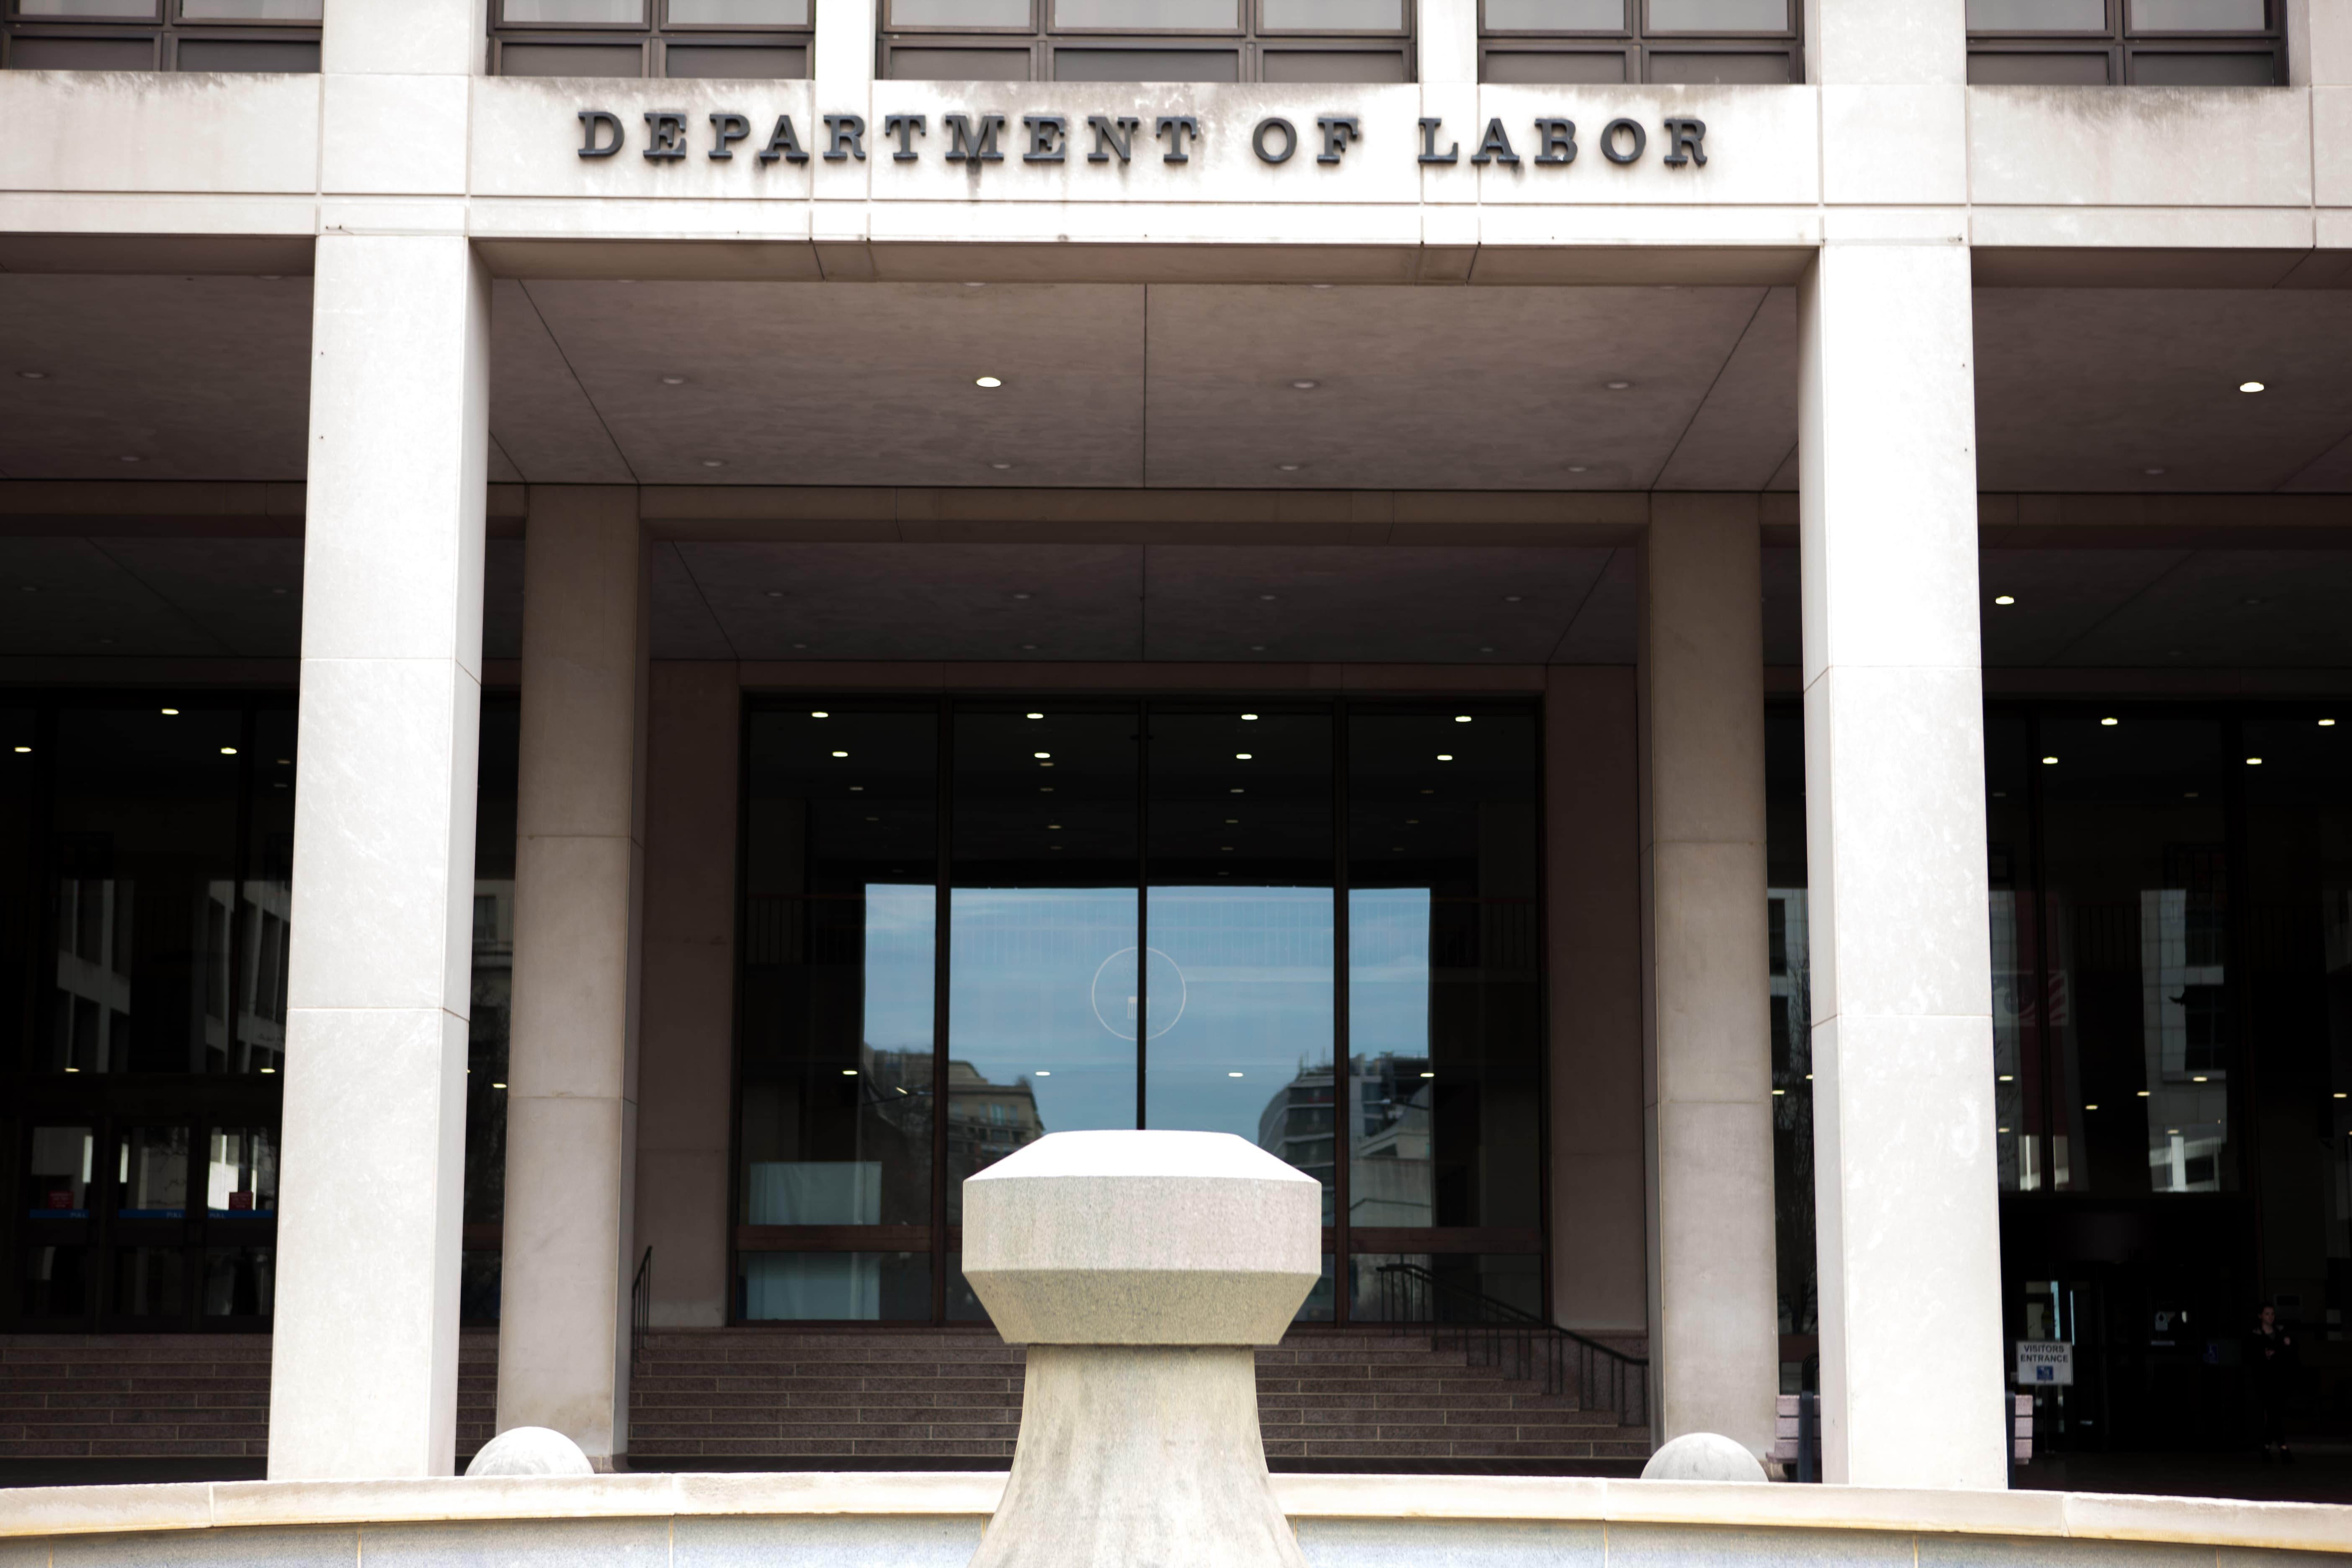 U.S. Department of Labor Building